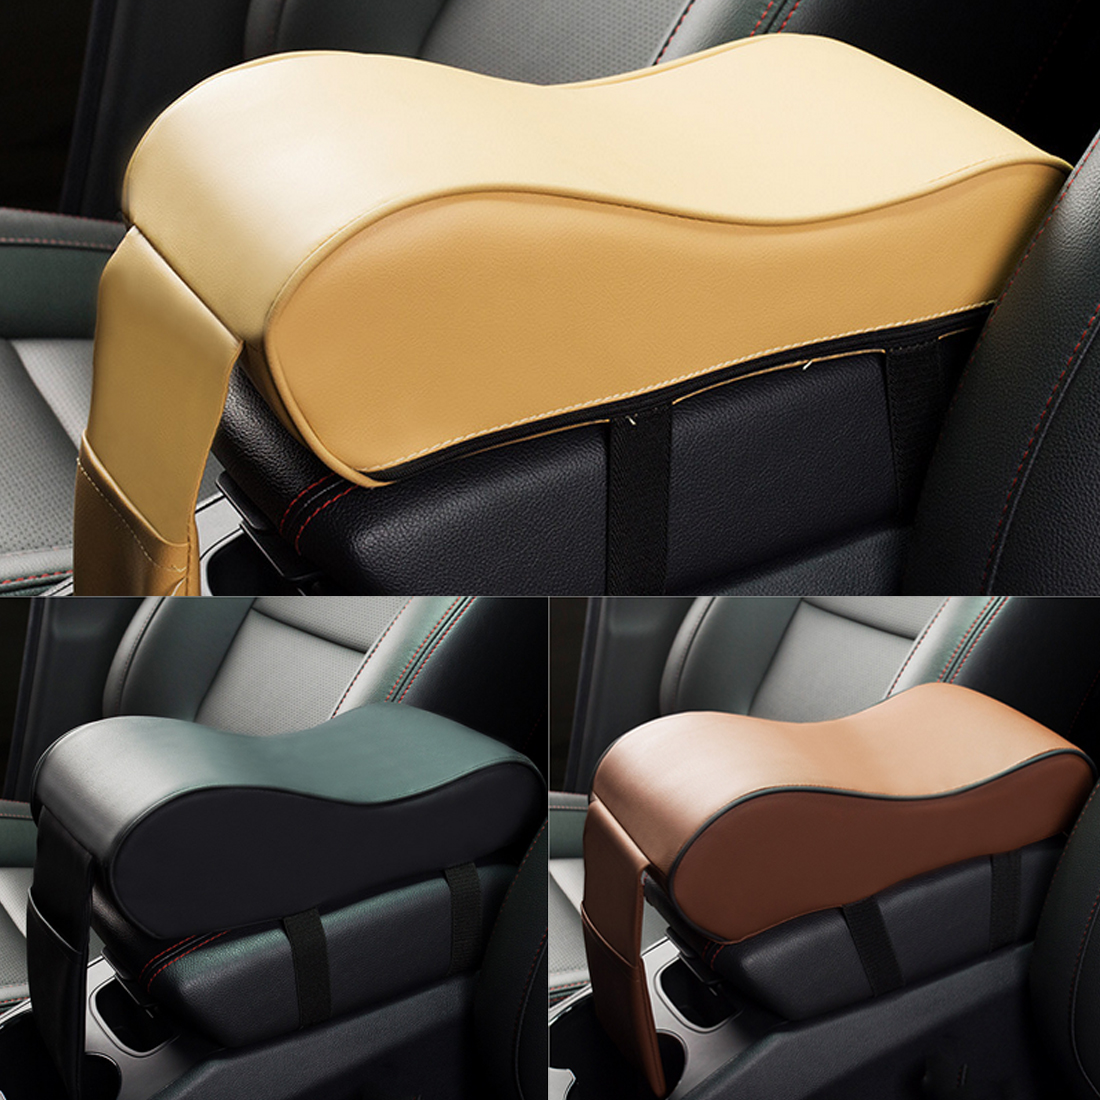 Dewtreetali Car Armrest Box Central Armrest Pad Car Styling Decoration Universal Protective Armrest Box Pad Center Console